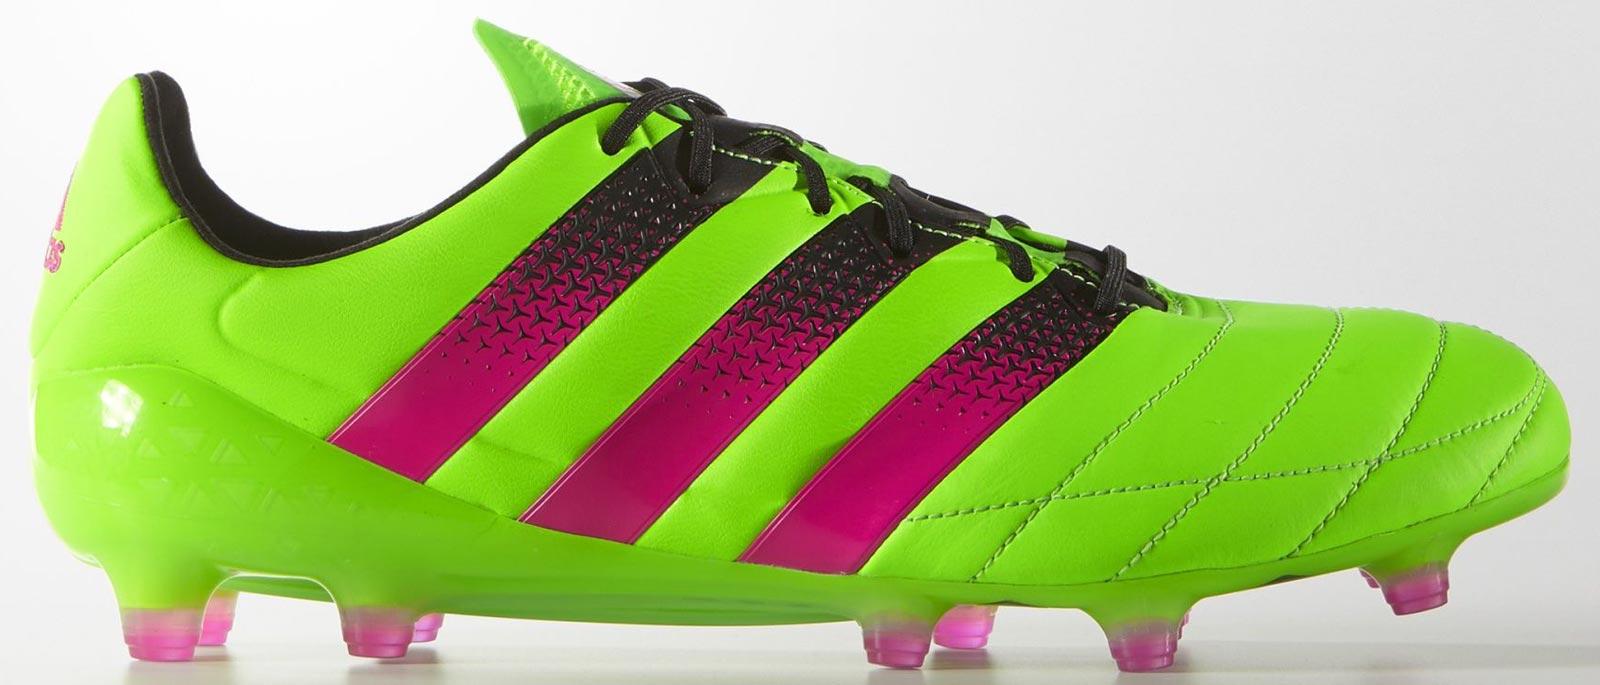 3cda260a5c5e Next-Gen Adidas Ace 16.1 Leather Solar Green   Shock Pink   Black